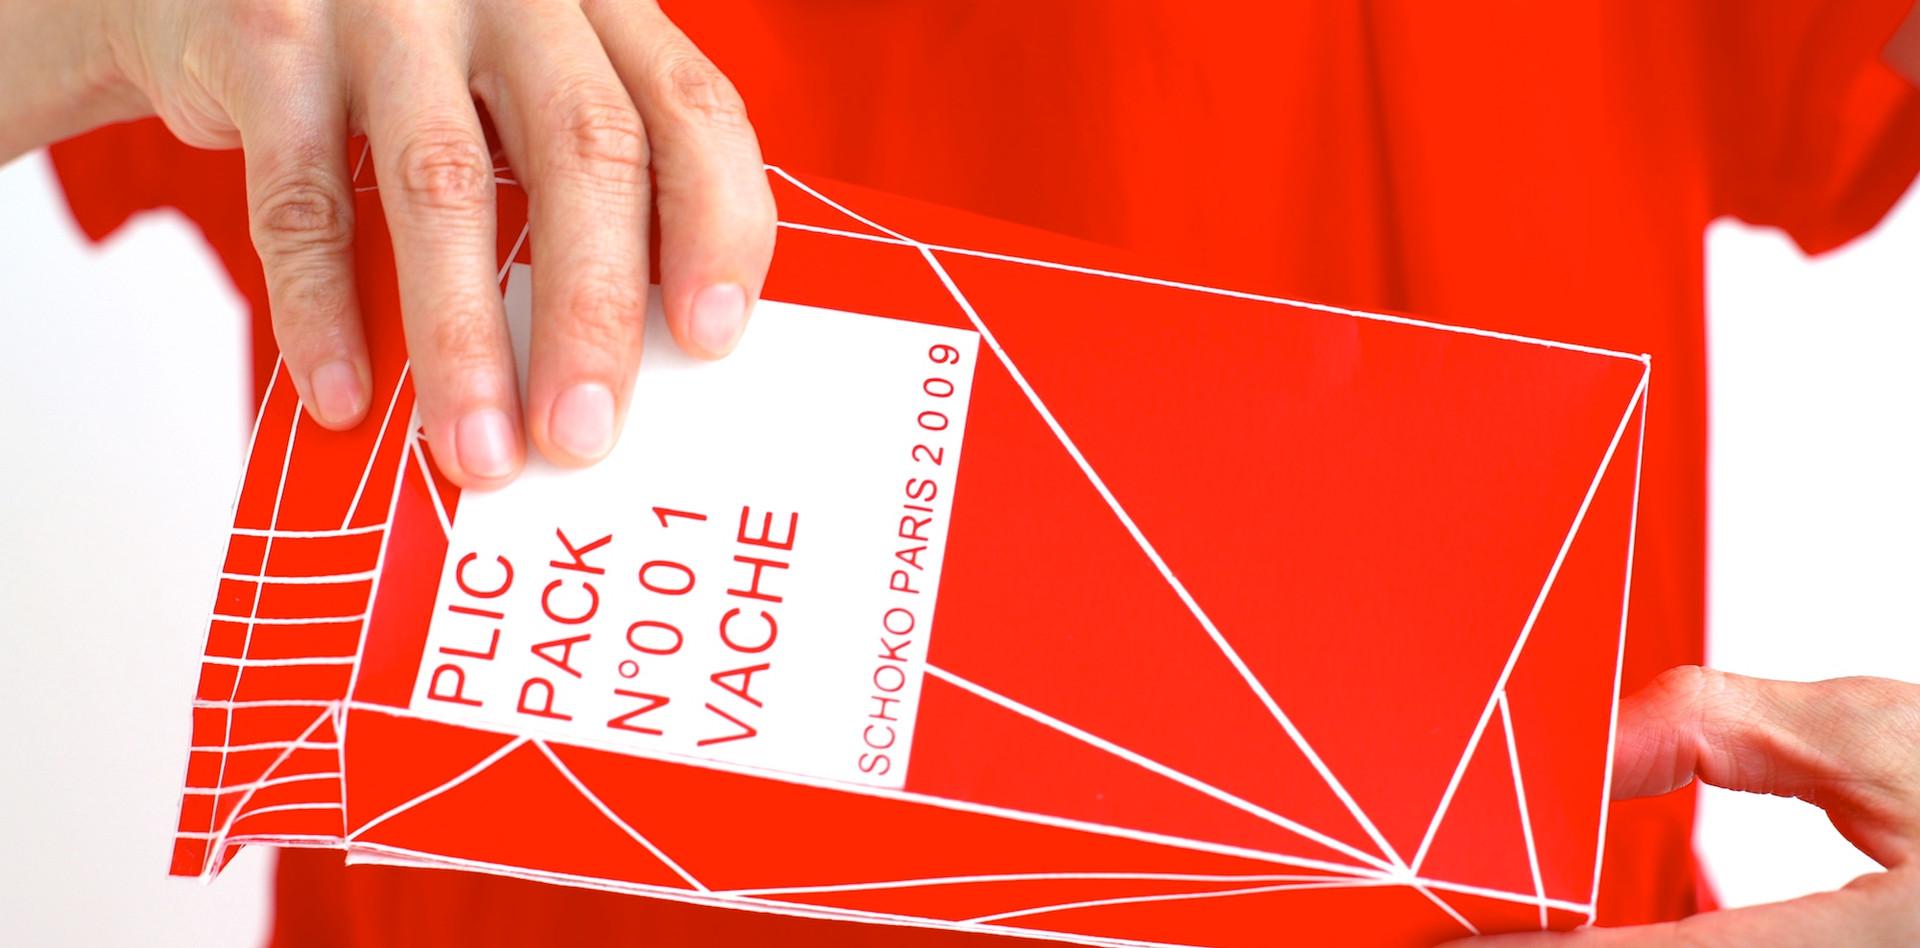 Step 3 PLIC PACK N°001 VACHE